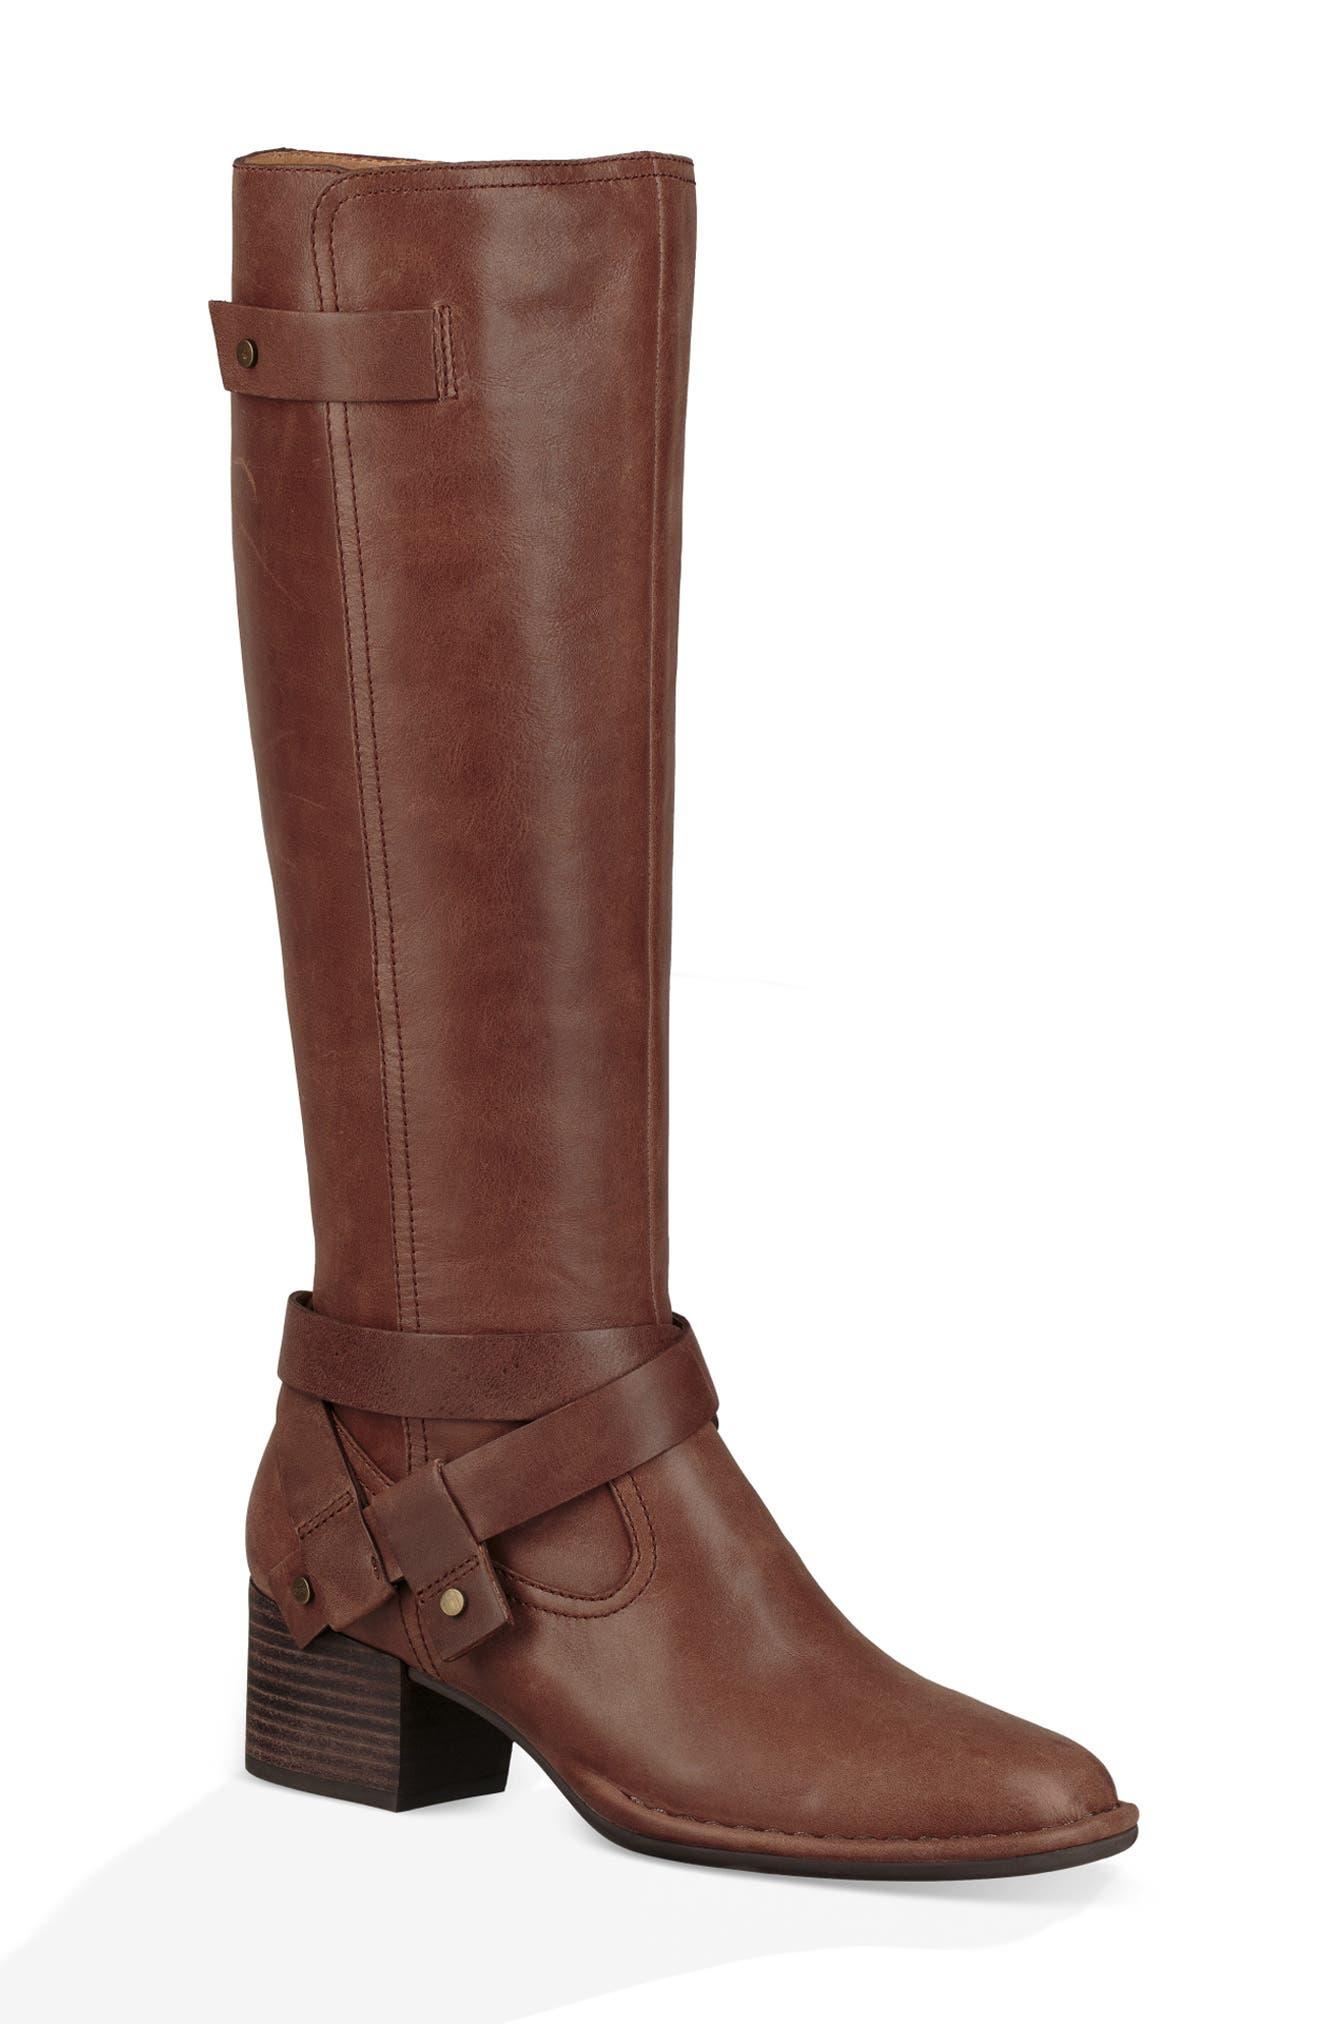 Ugg Bandara Knee High Boot, Brown